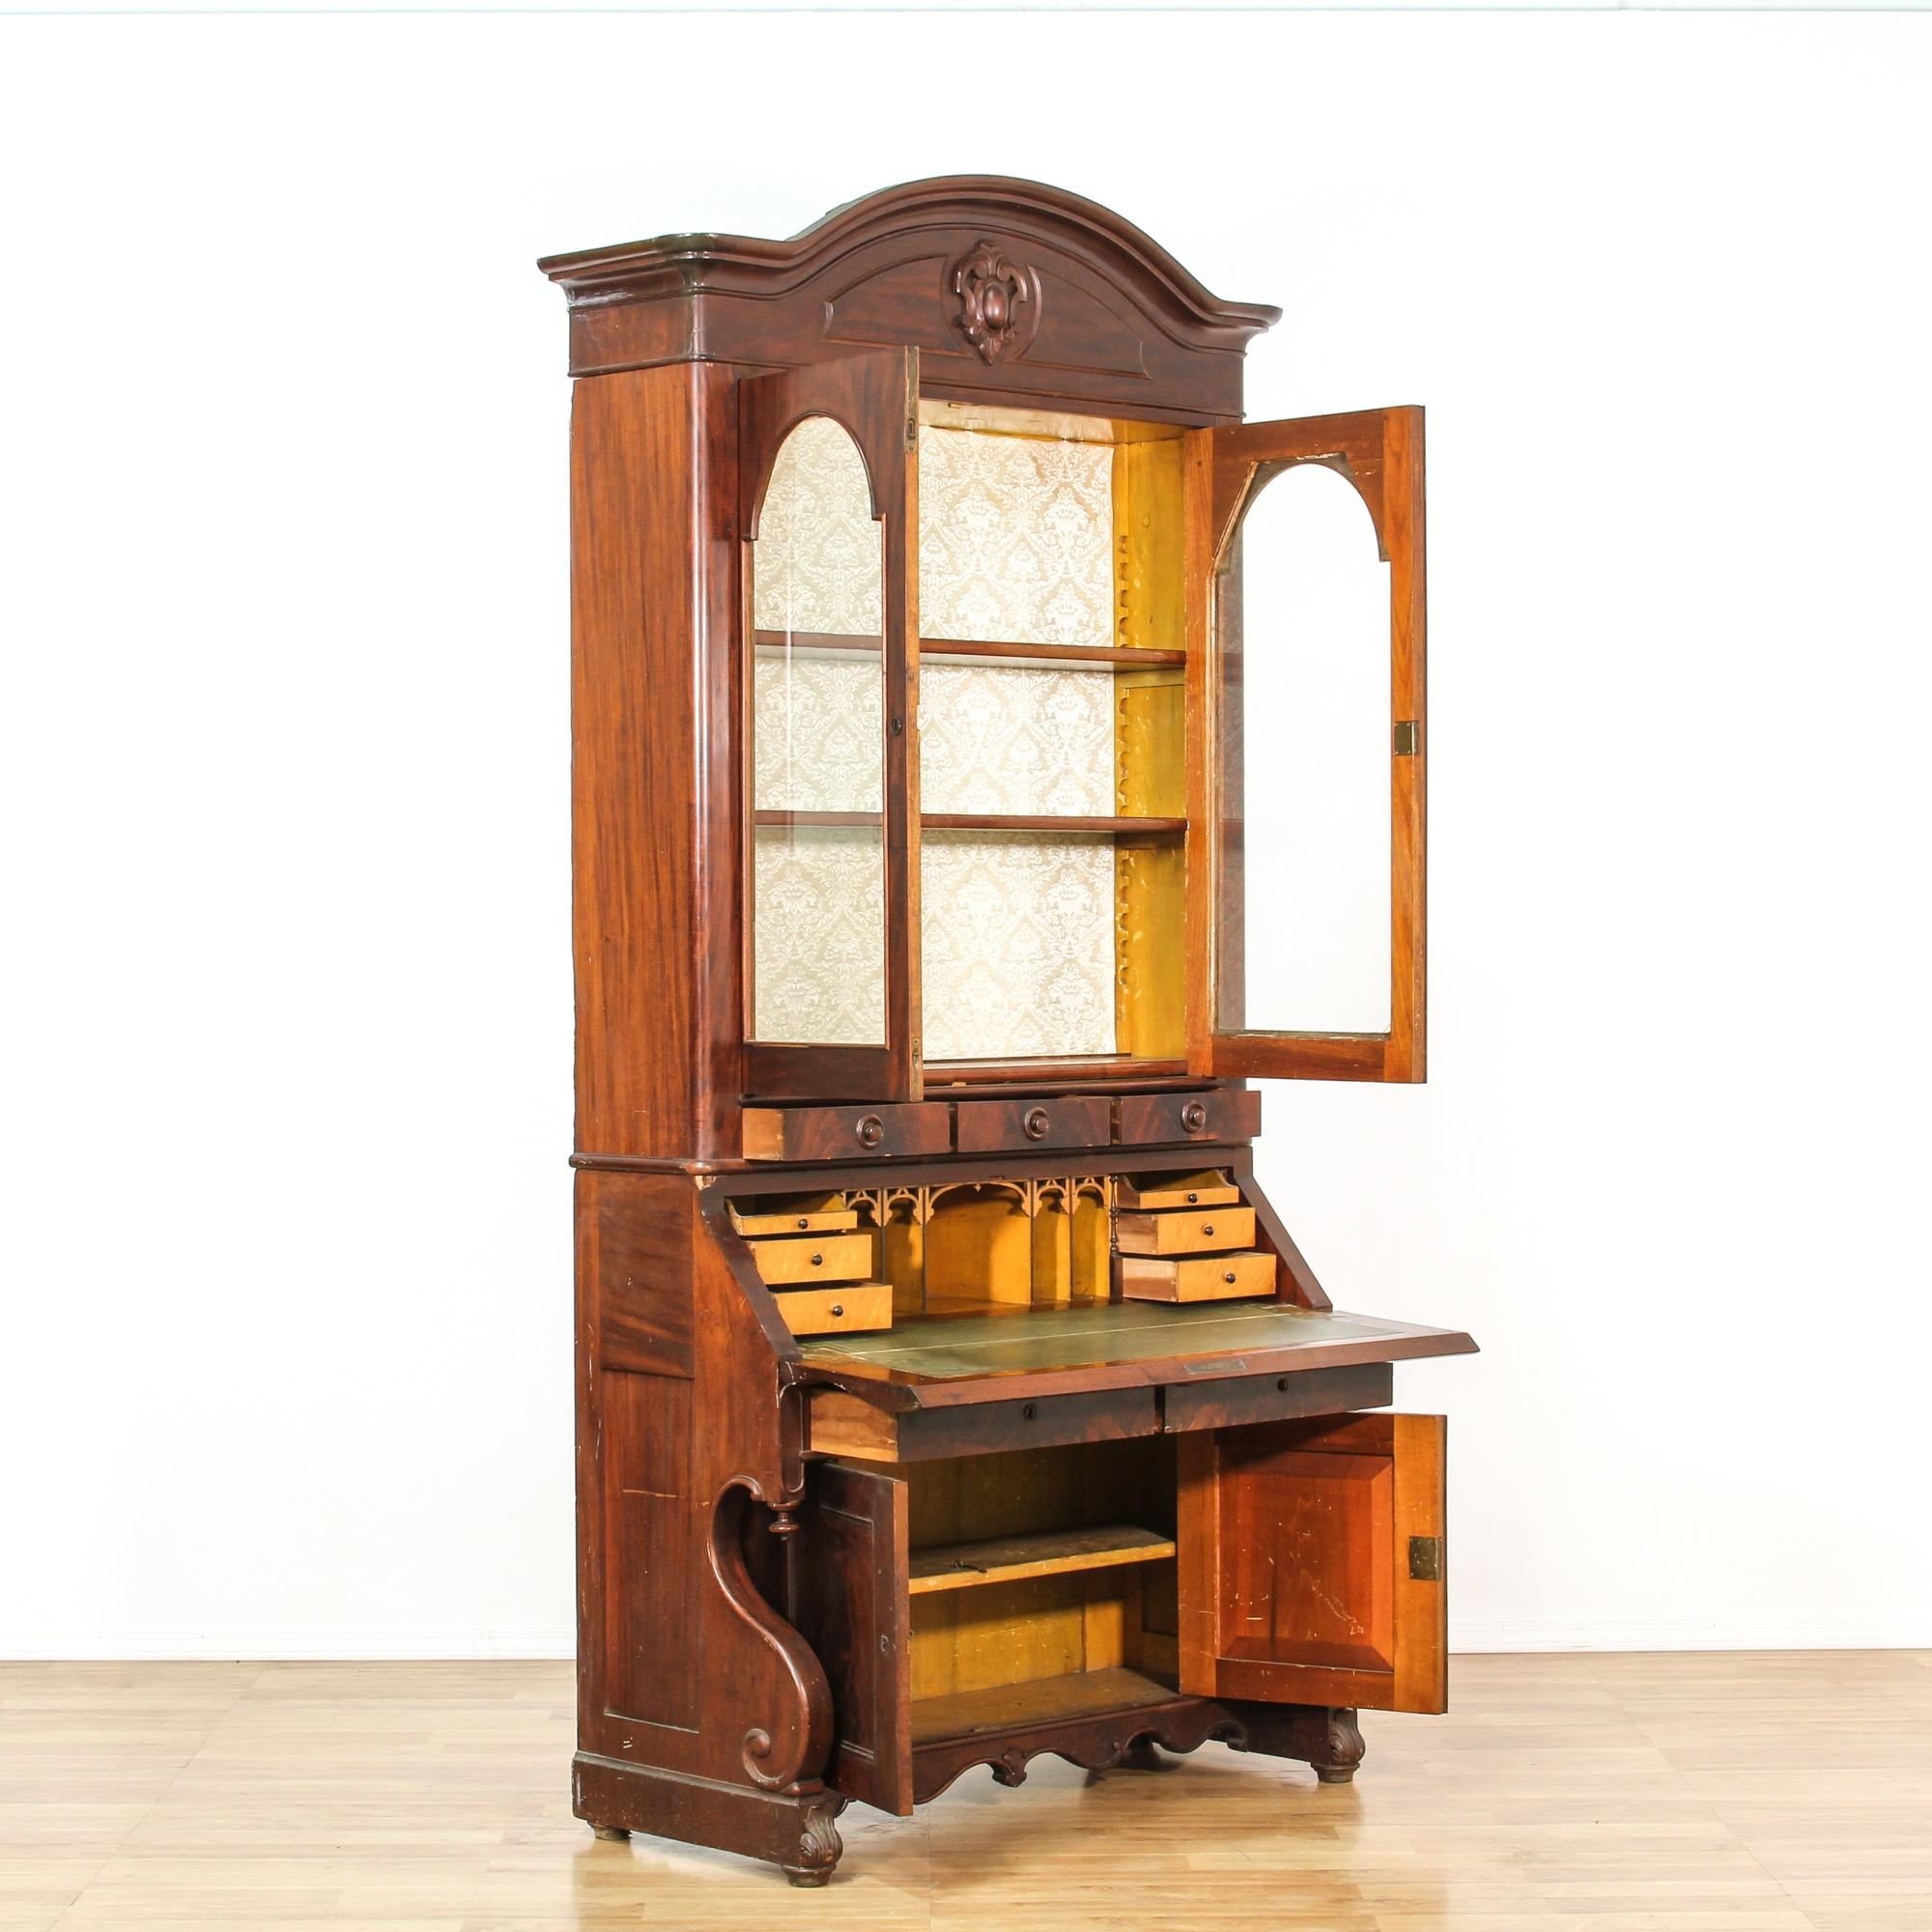 American Furniture Warehouse Desks ... Bureau Bookcase | Loveseat Vintage Furniture San Diego & Los Angeles